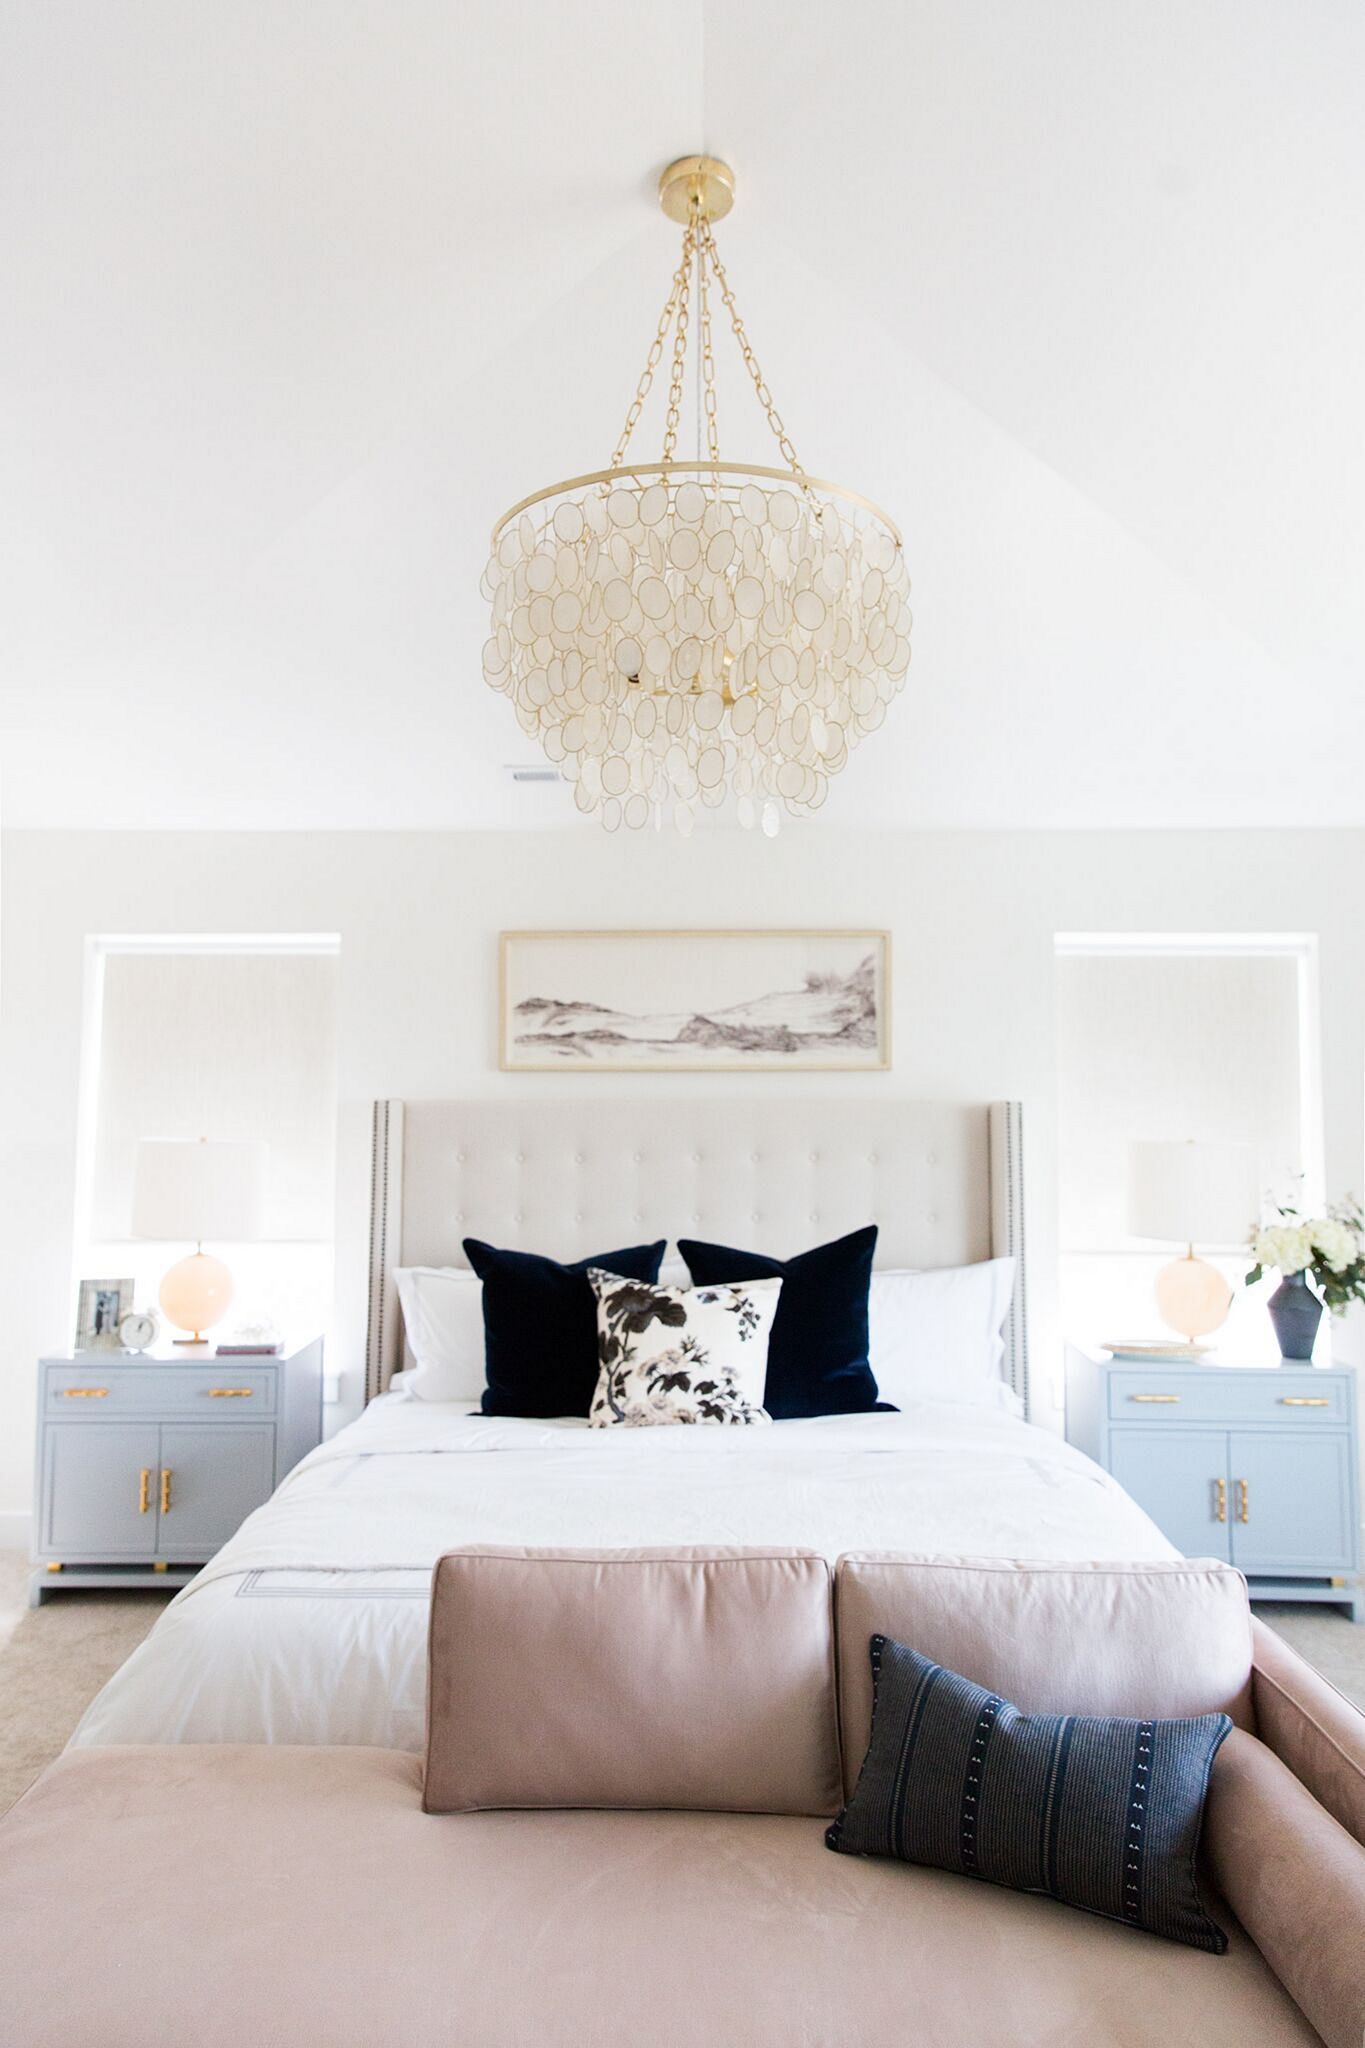 Stylish Bedroom Concepts  June, 2018